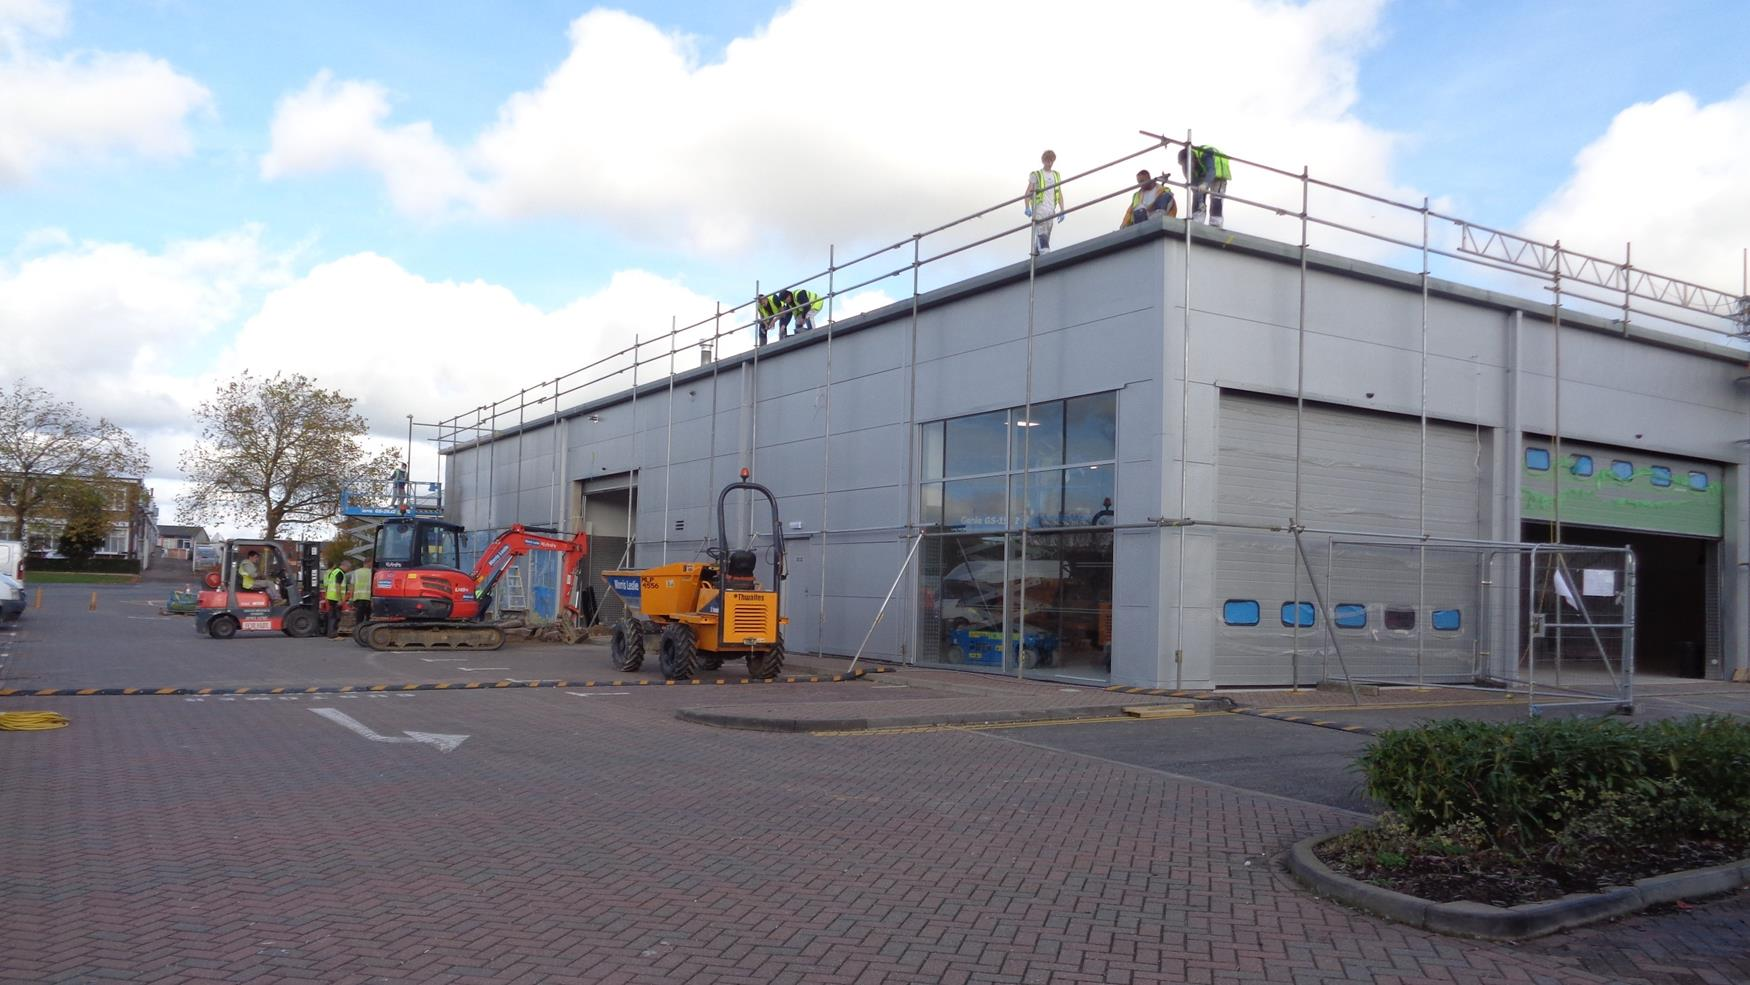 Full external dealership refurbishment